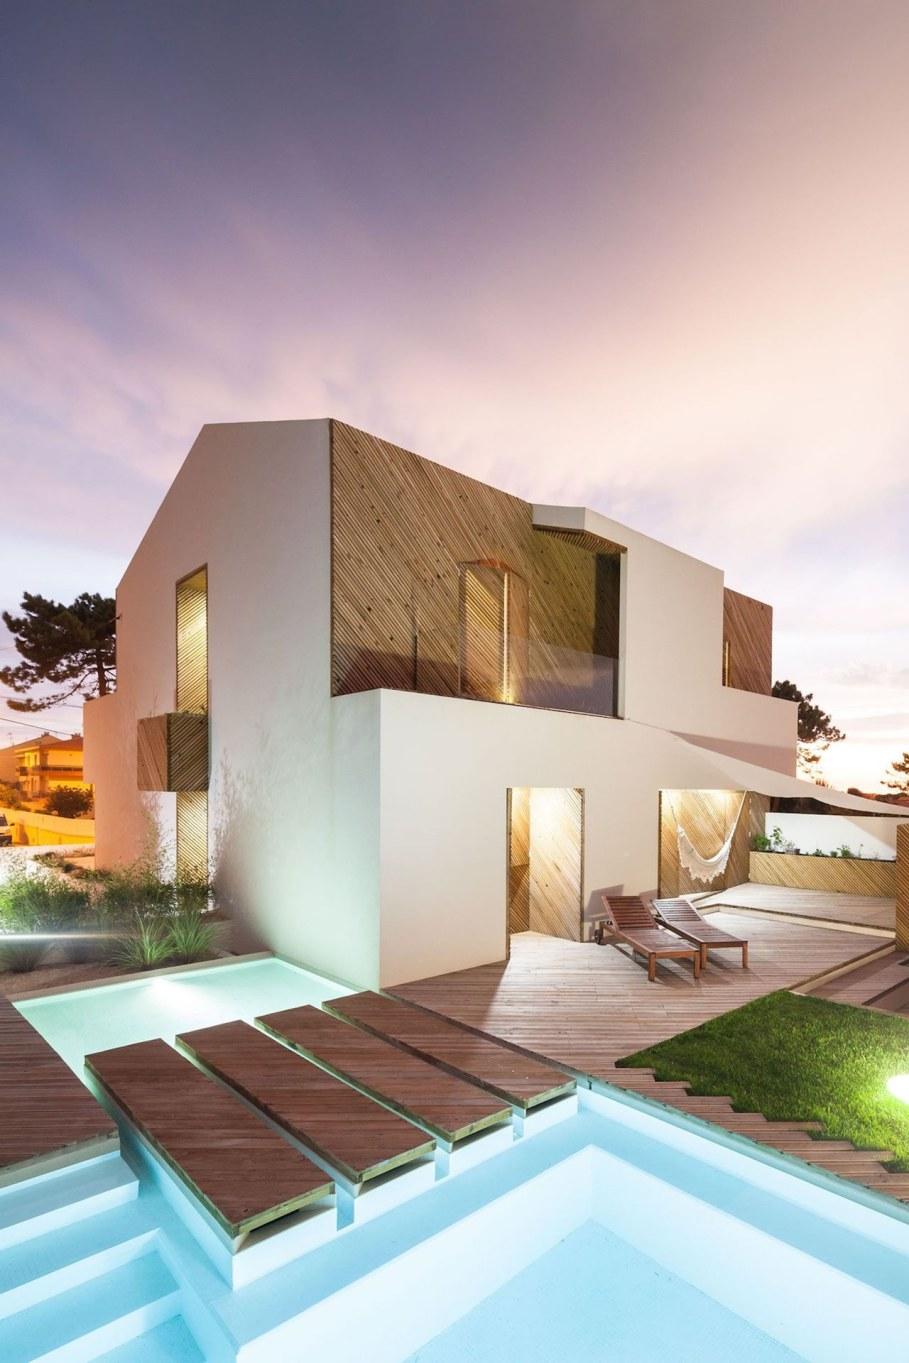 Silver Wood House By Ernesto Pereira 13